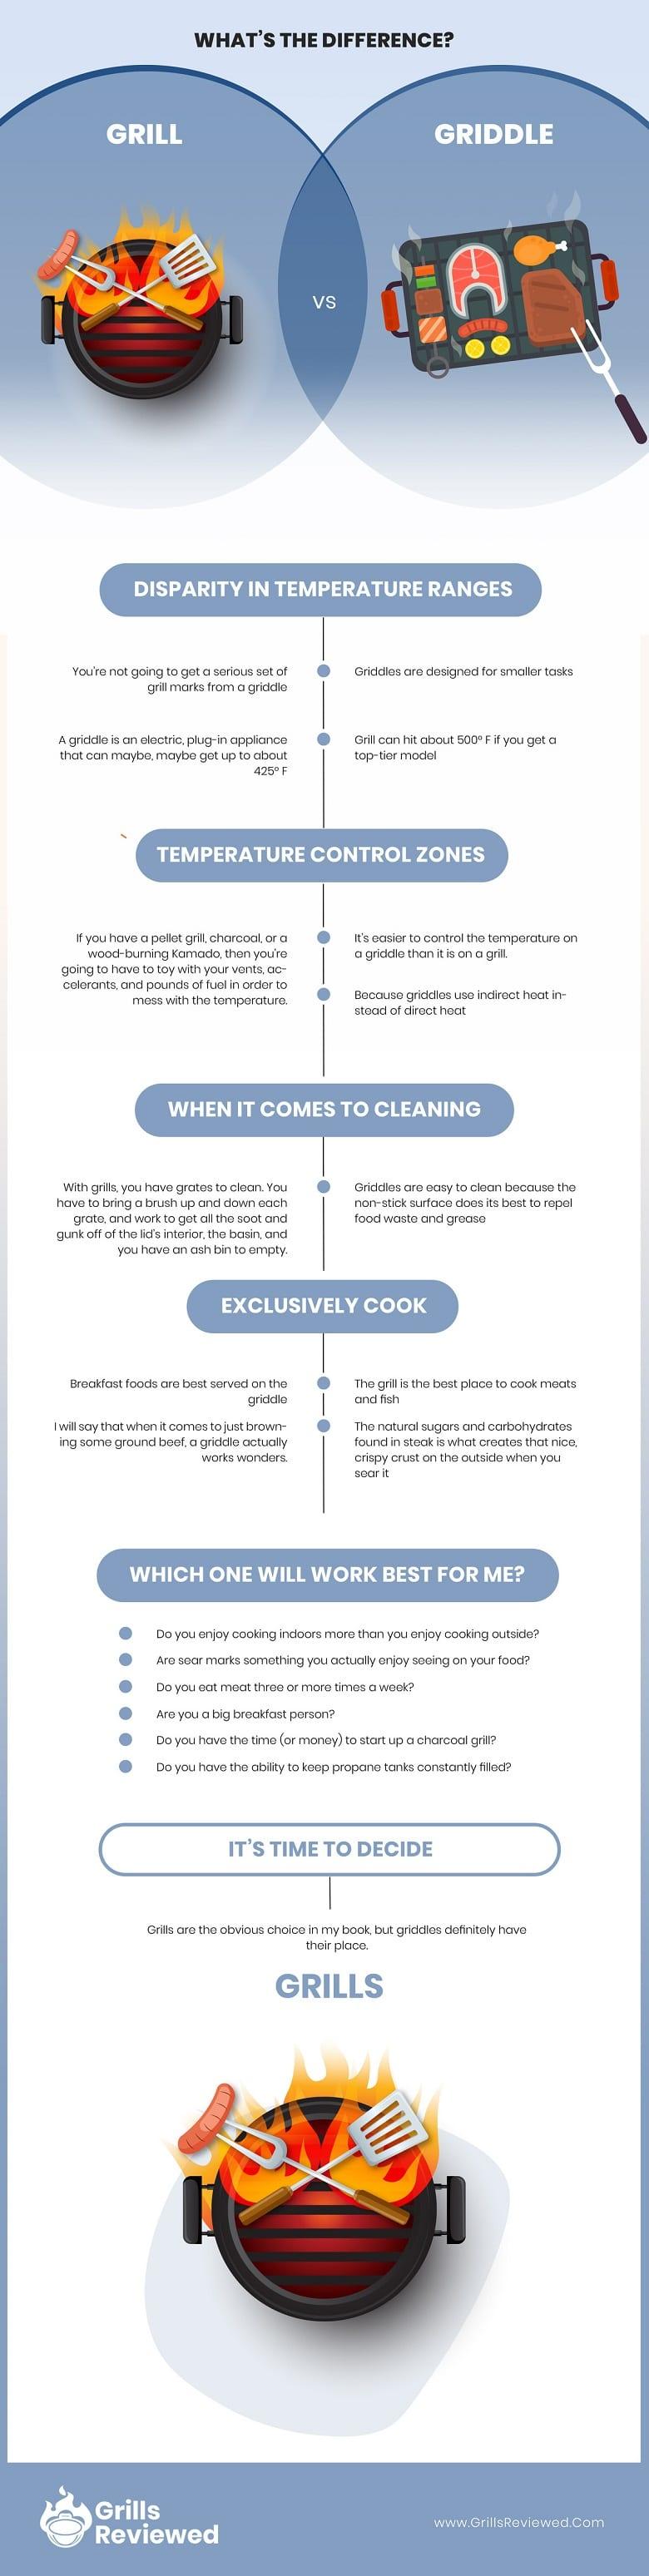 Grill vs Griddle